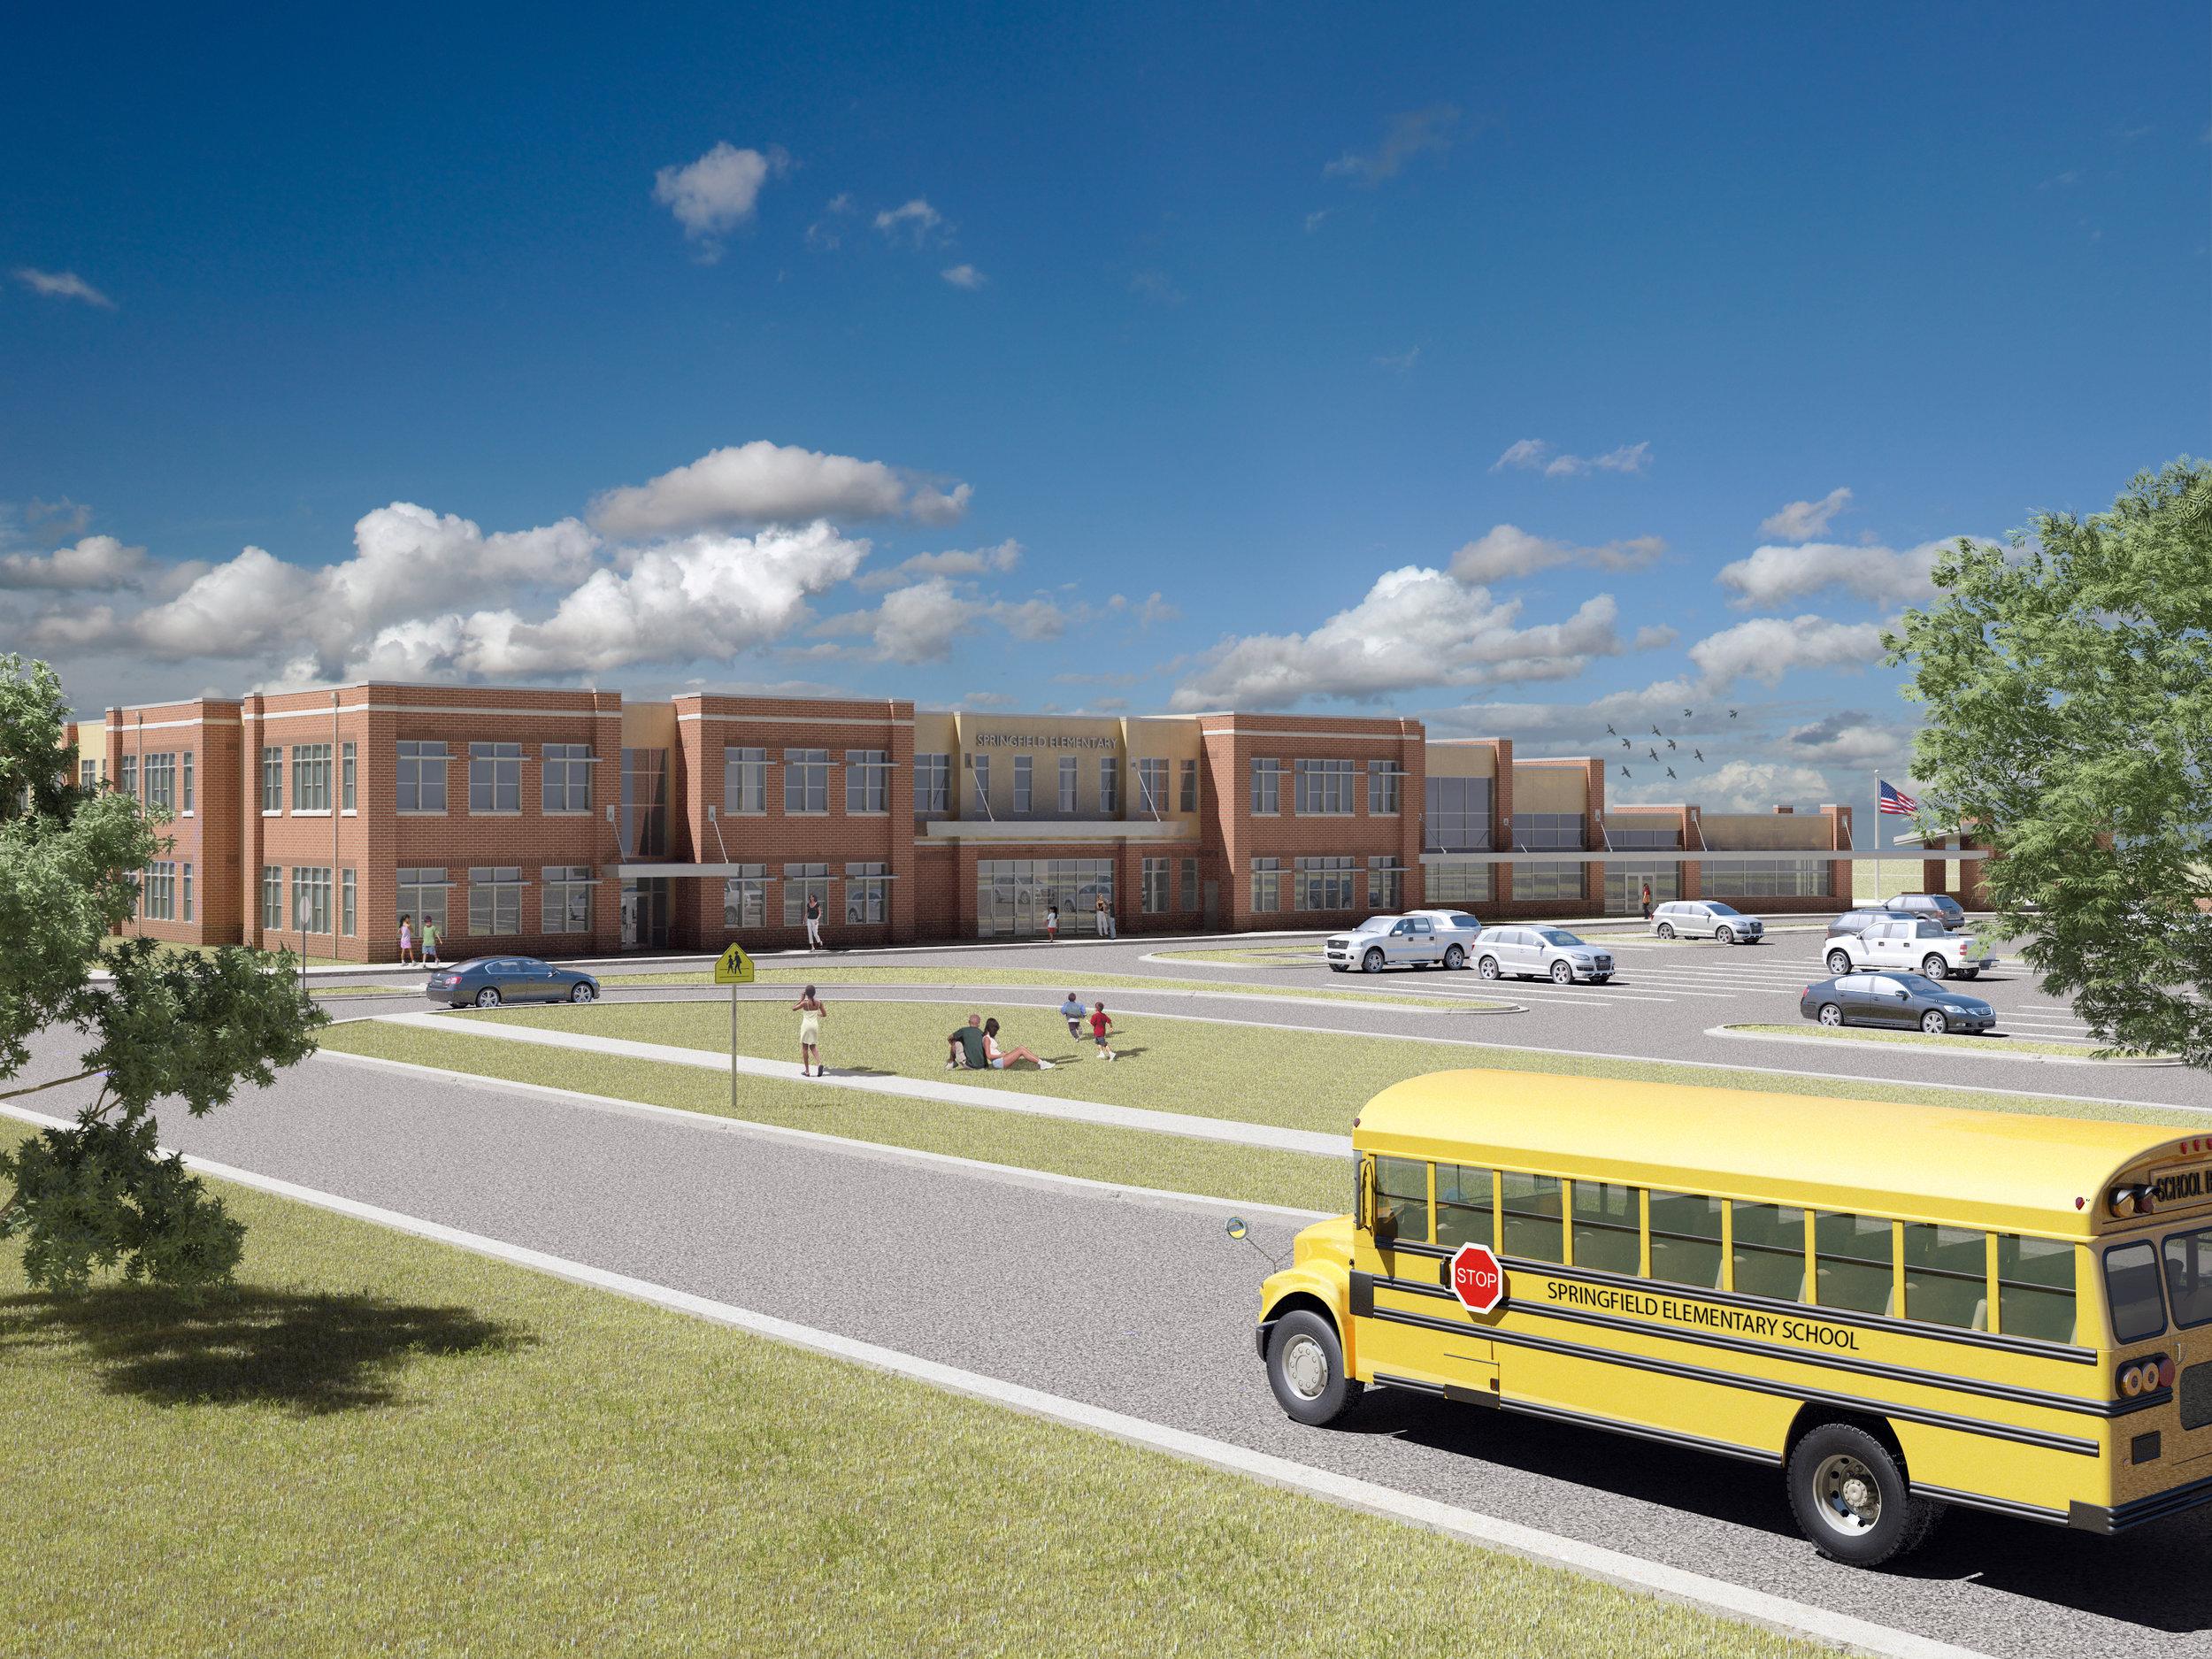 Springfield Elementary School